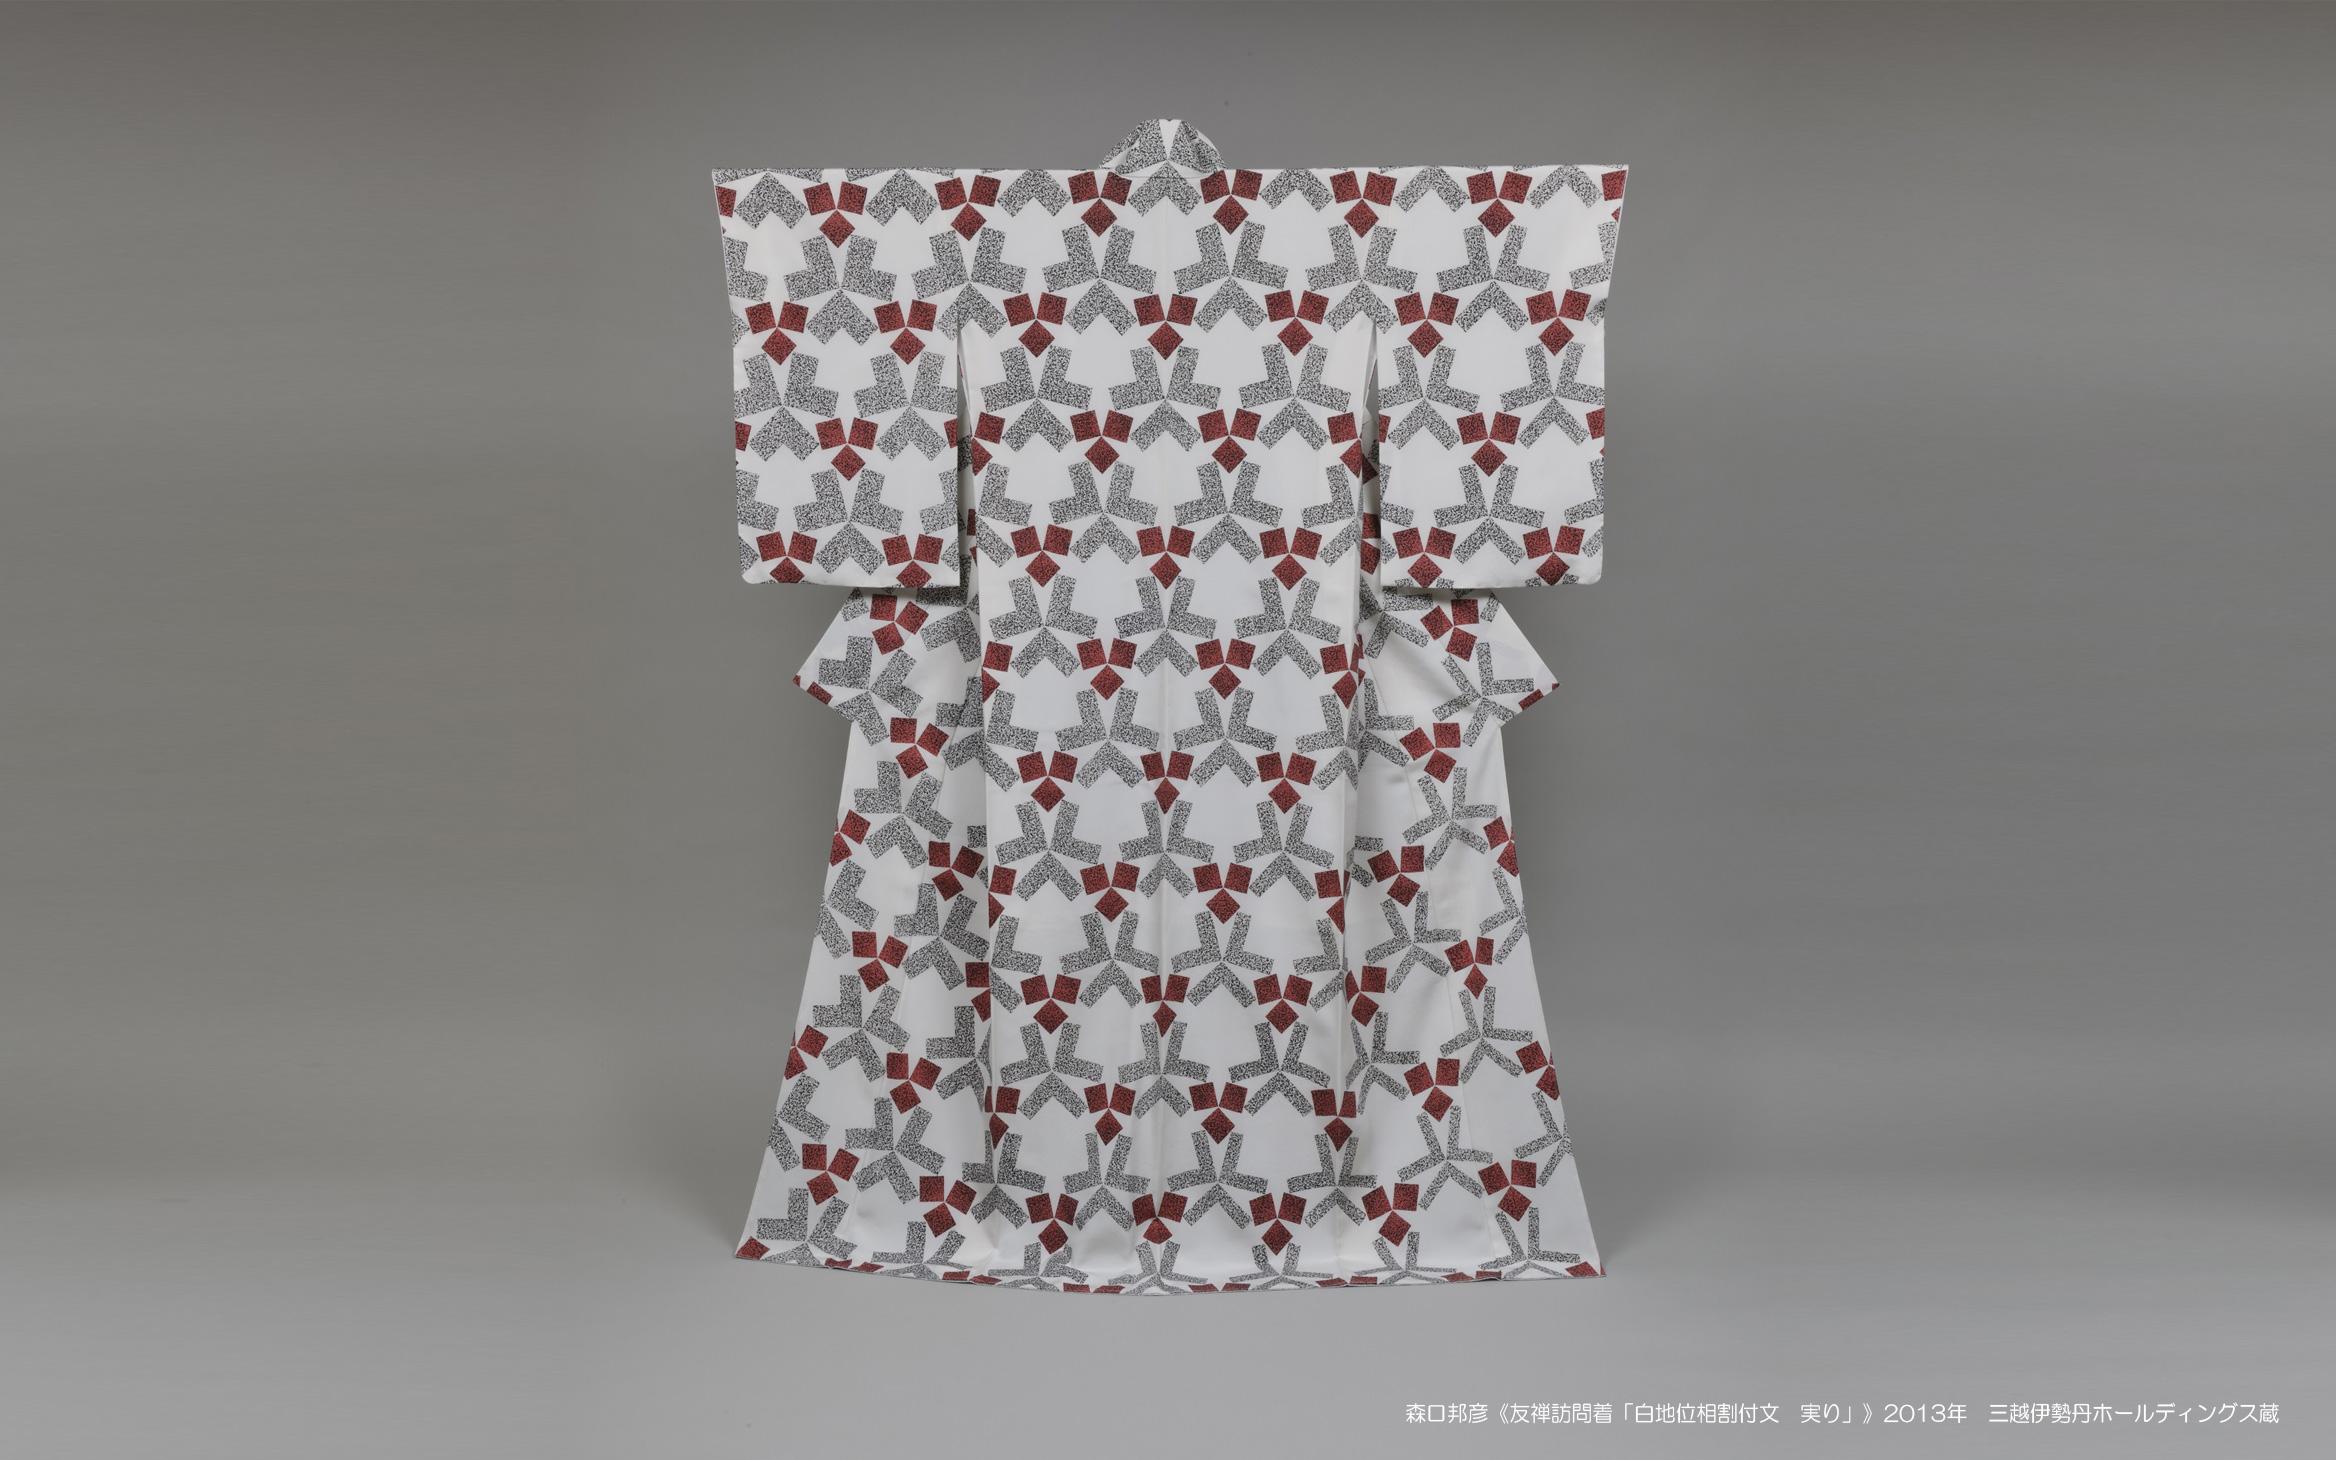 Formal Yuzen dyeing kimono with dynamic geometric pattern on white ground